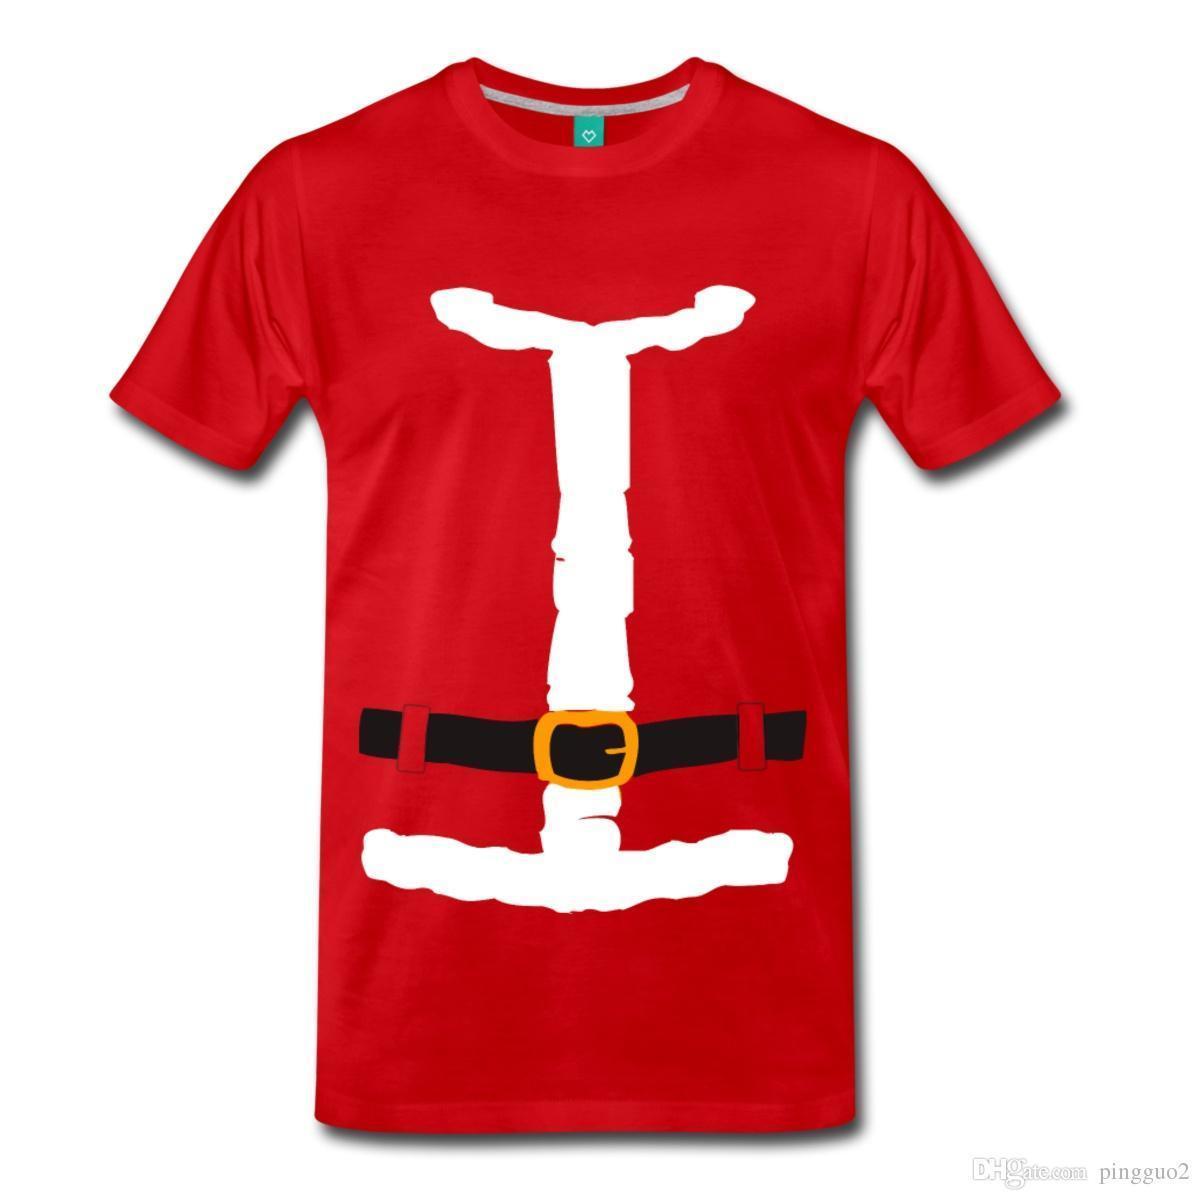 36b576bcbe98 Santa Suit Men S T Shirt 2017 Summer New Brand T Shirt Men Hip Hop Men T  Shirt Casual Fitness New Funny Brand Clothing Top T Shirt Sites Cool T  Shirts For ...